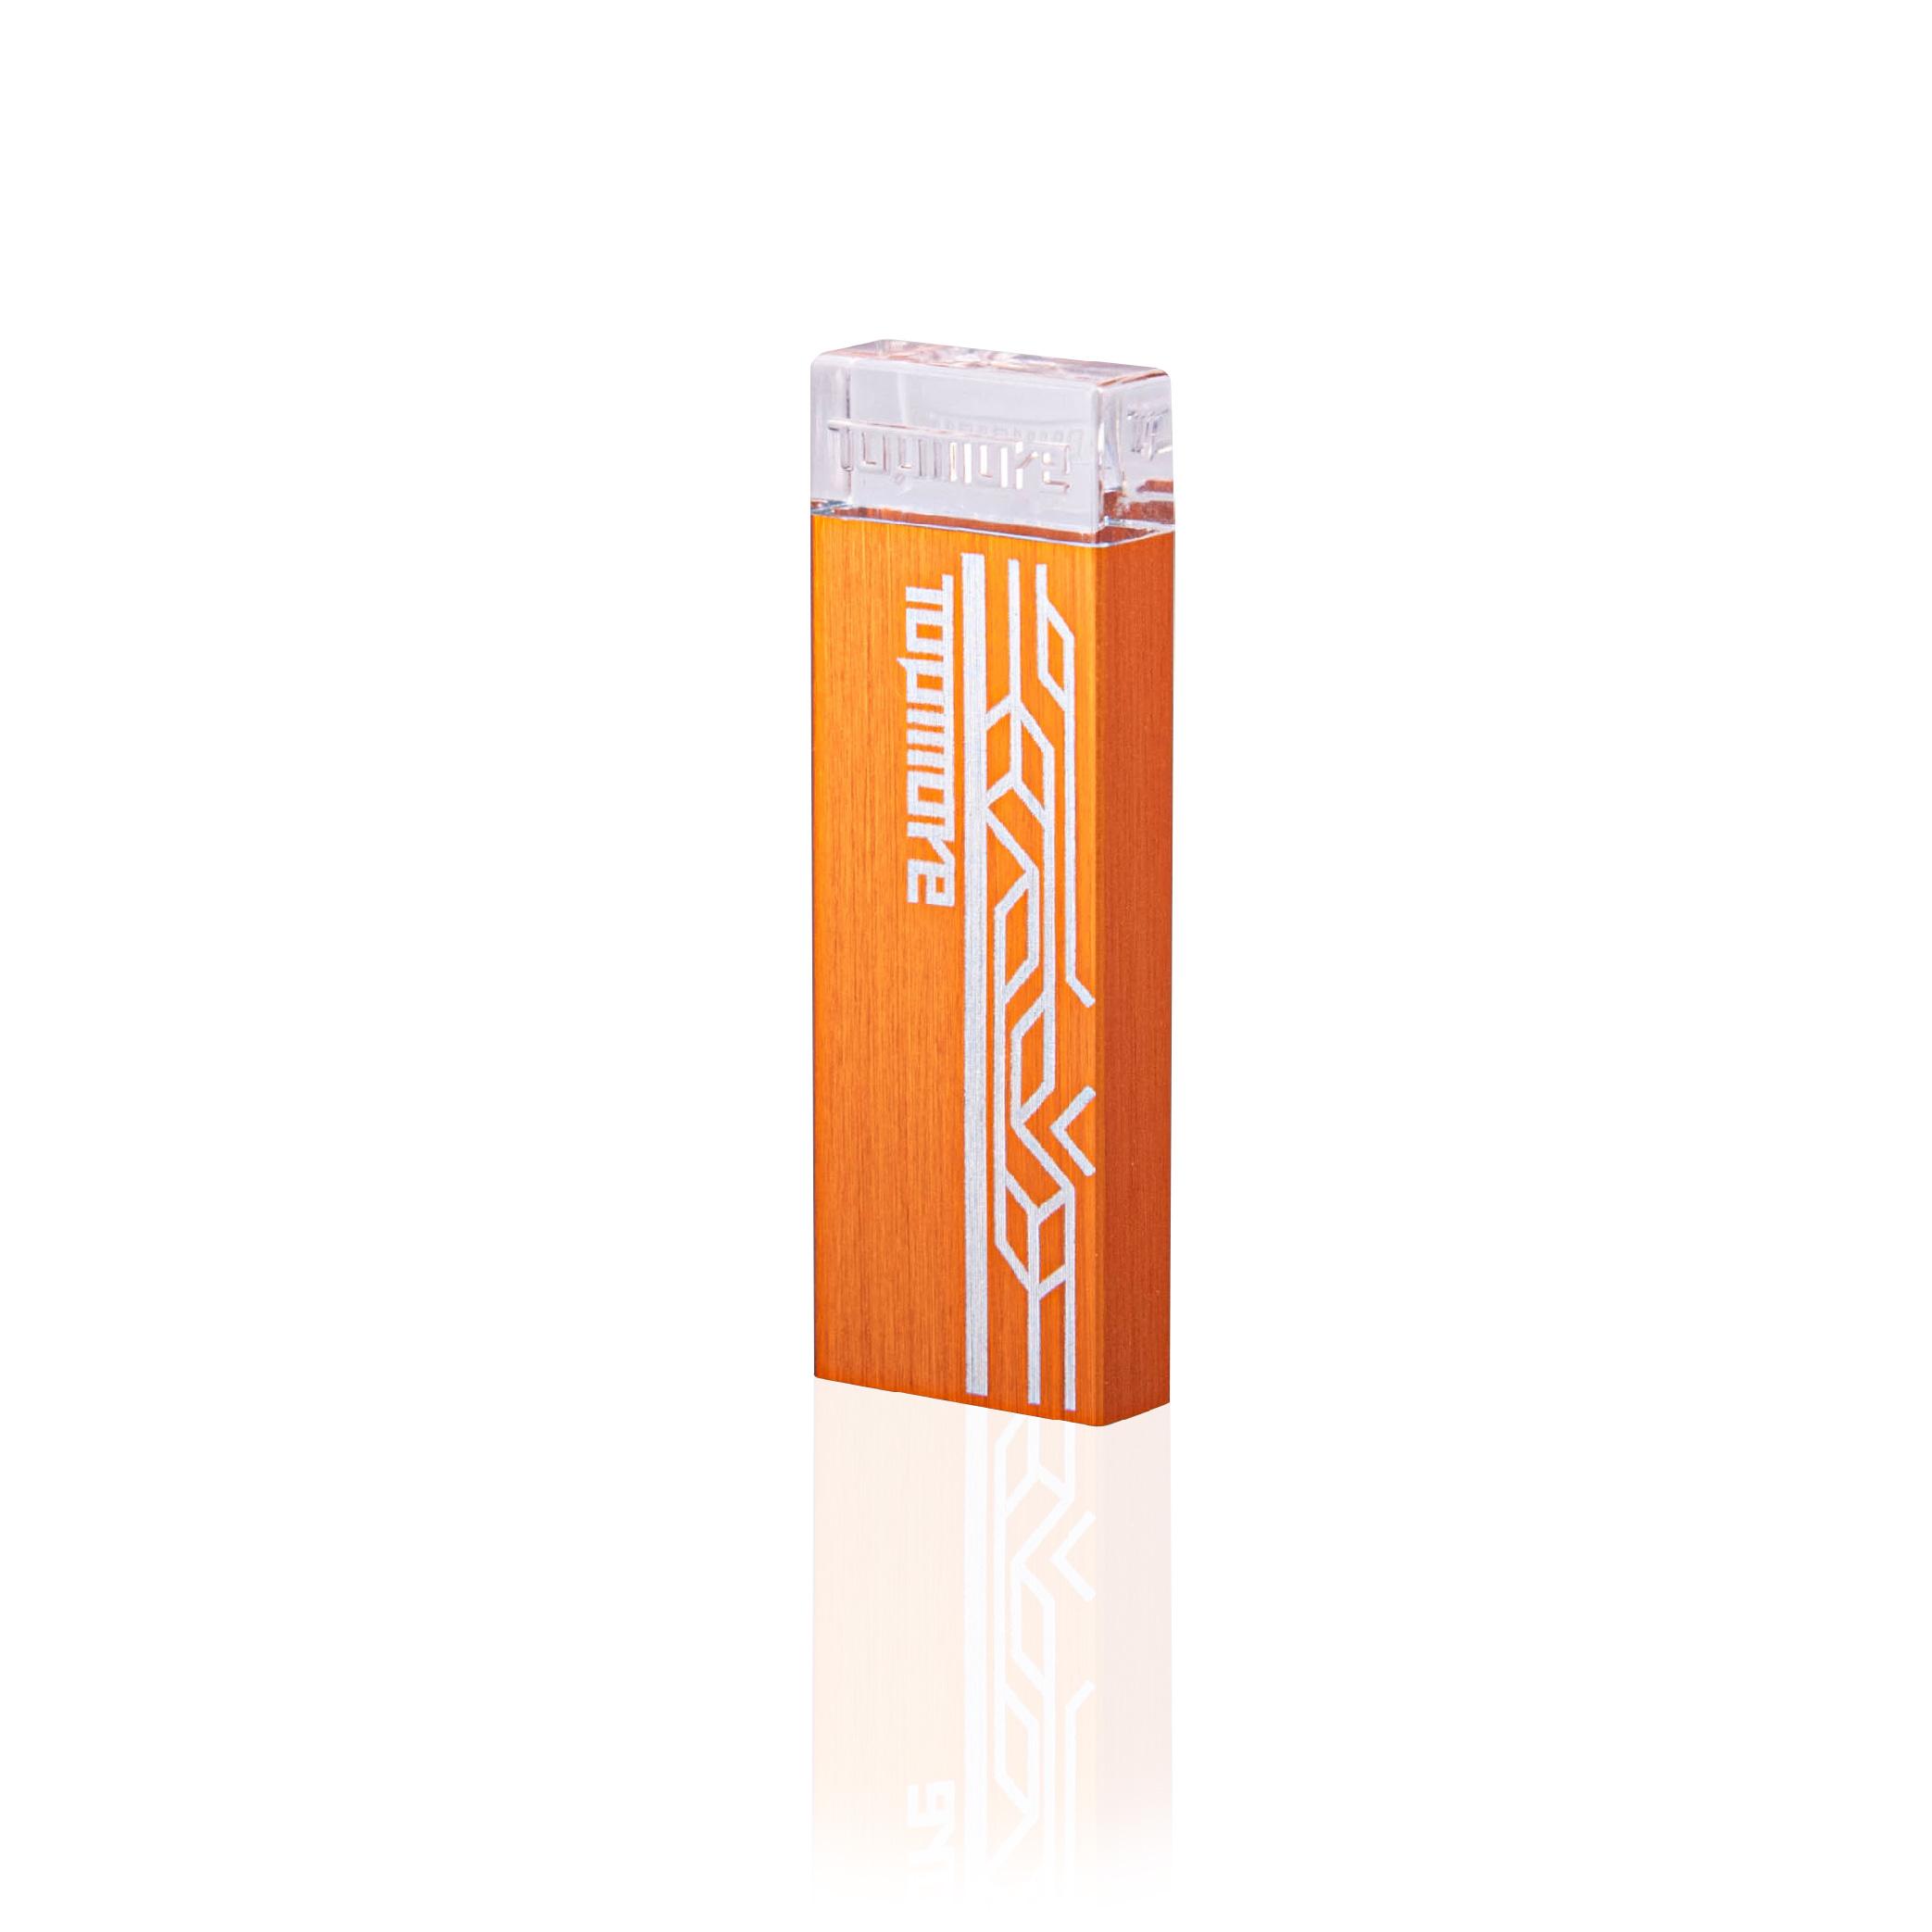 Topmore 達墨系列AI發光隨身碟 USB3.0 32GB-橘色